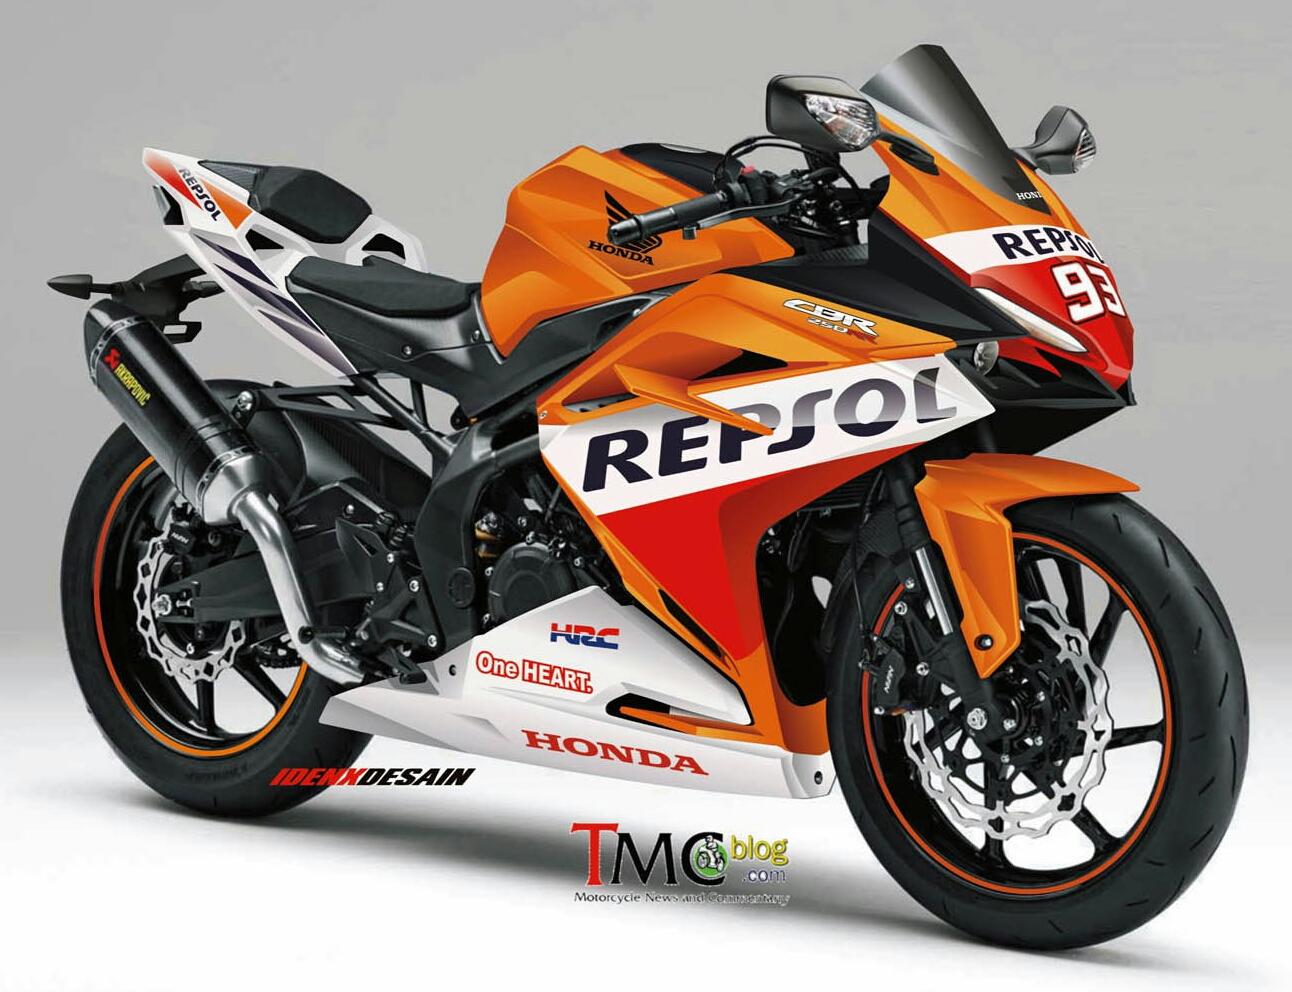 hight resolution of 2016 2017 honda cbr250rr repsol sportbike motorcycle cbr350rr cbr300rr light weight super sports